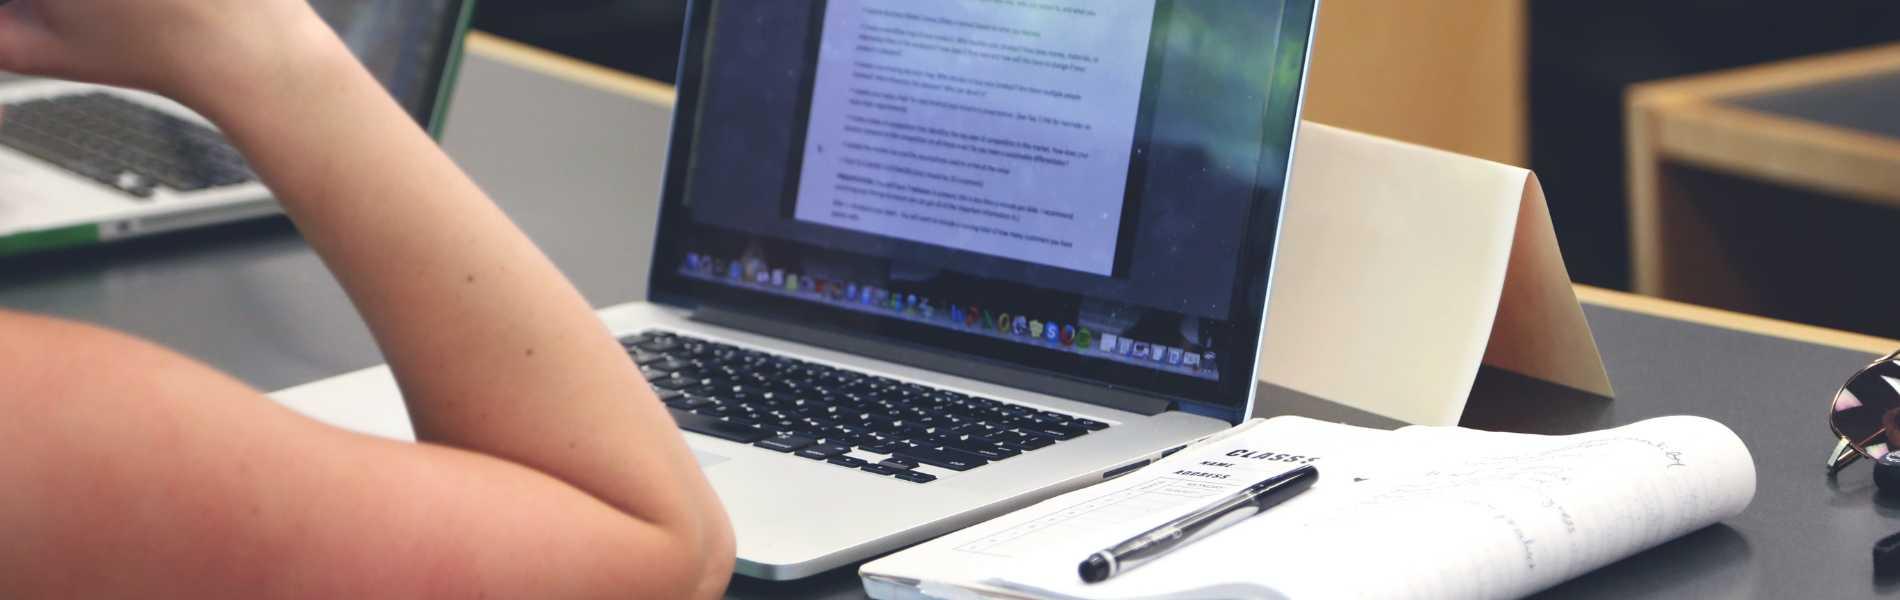 Métodos para que tus cursos online destaquen